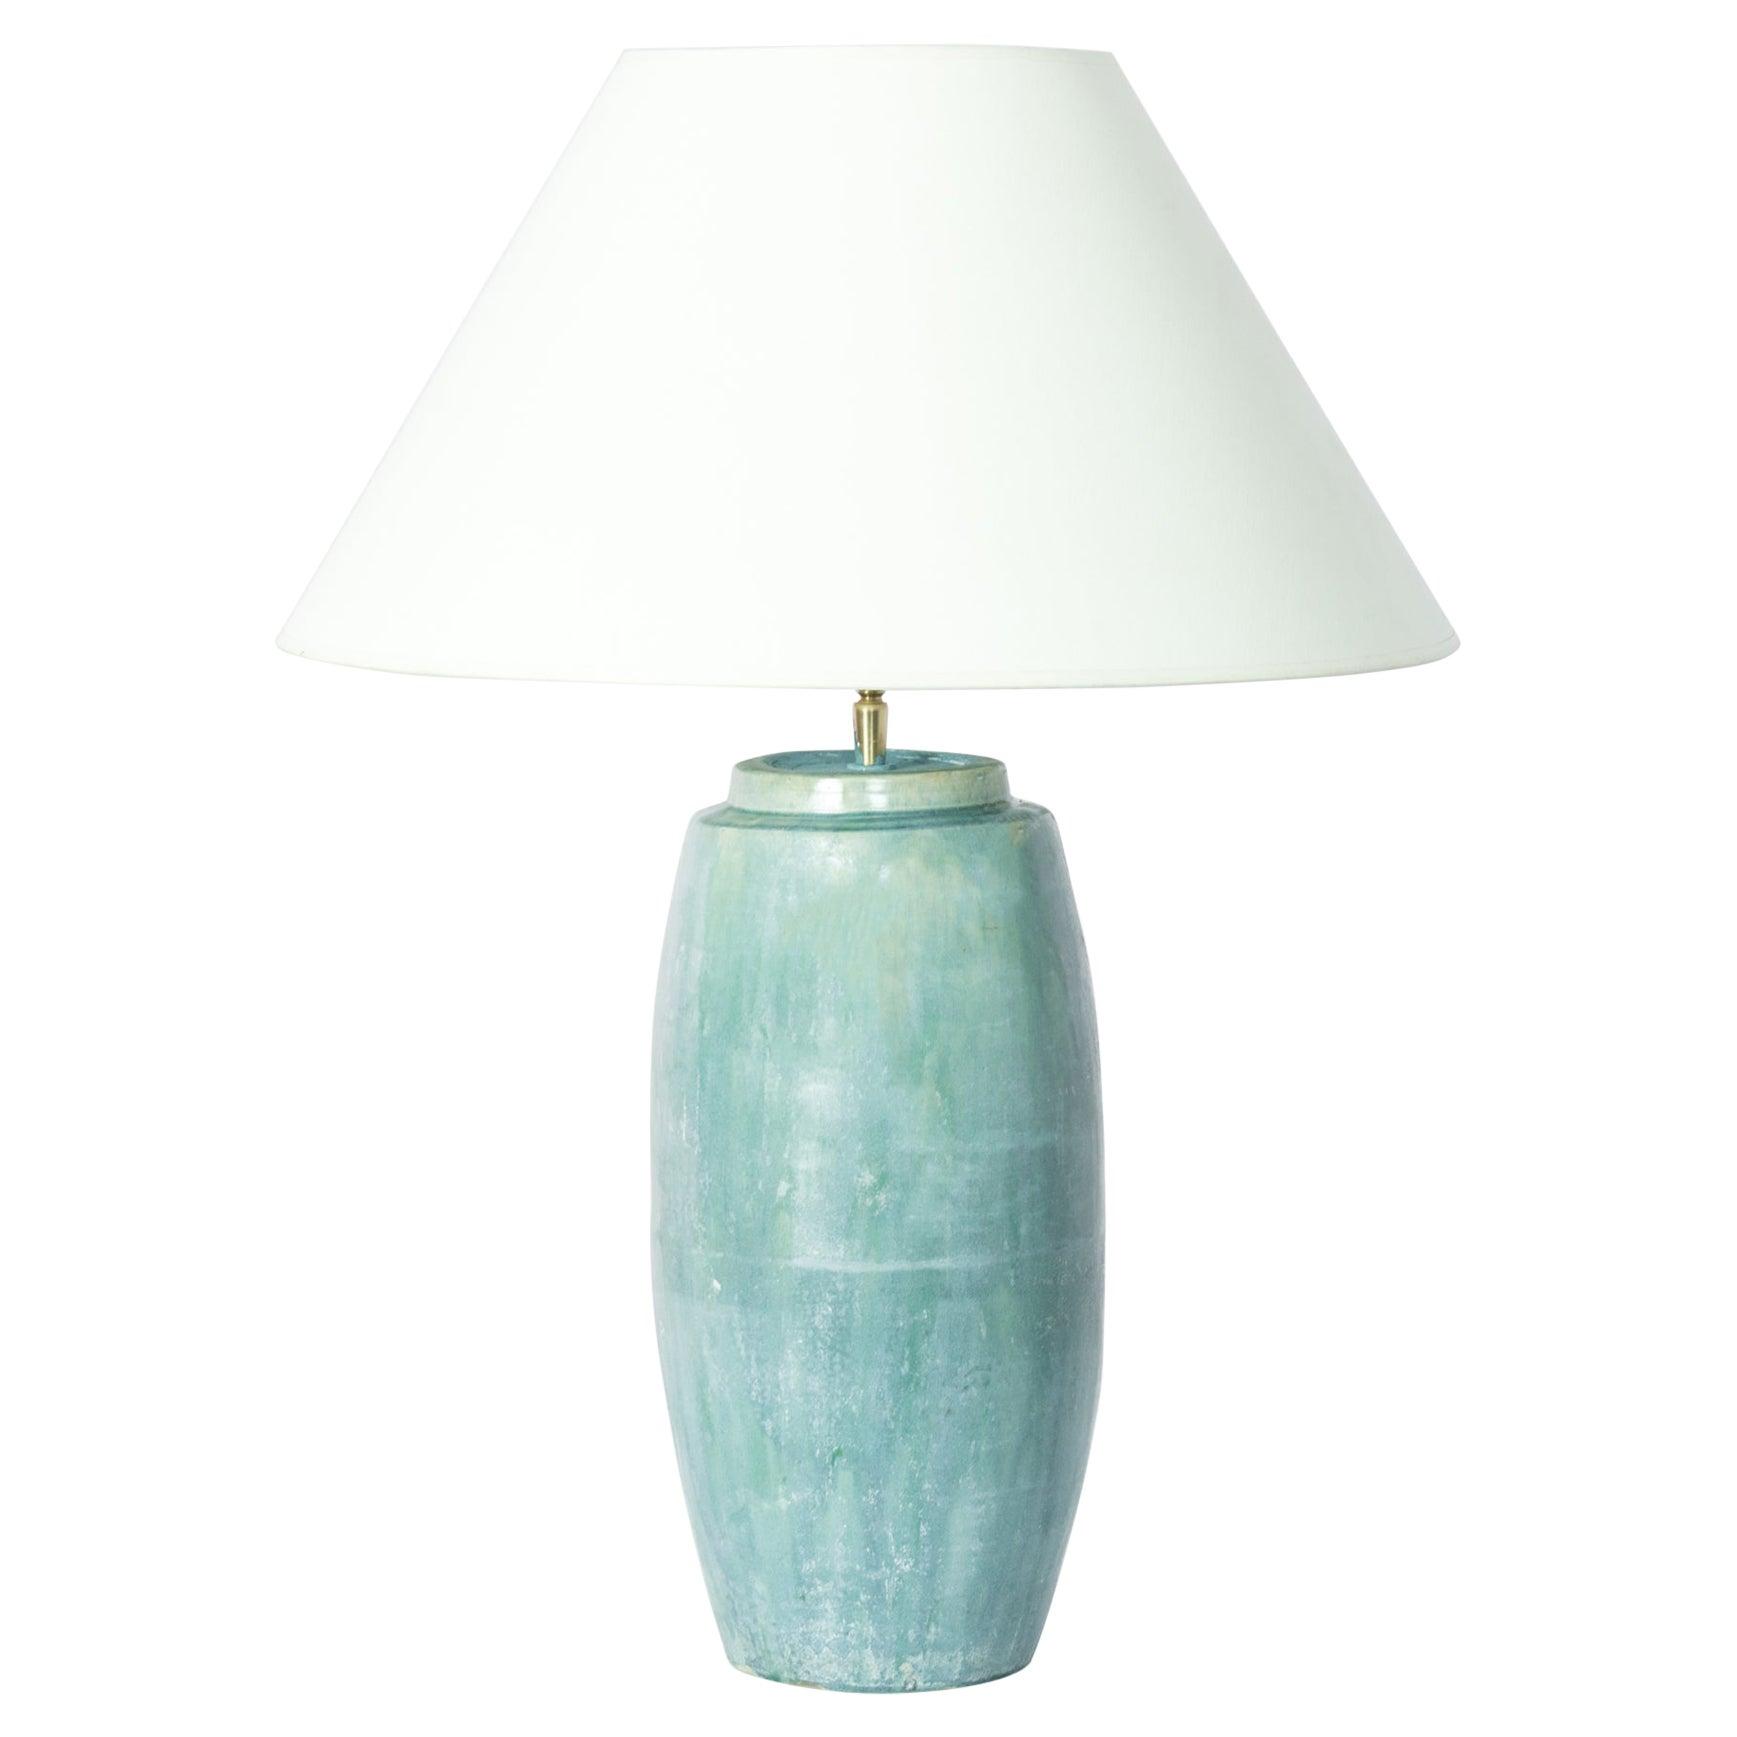 Vintage Chinese Celadon Ceramic Vase Table Lamp